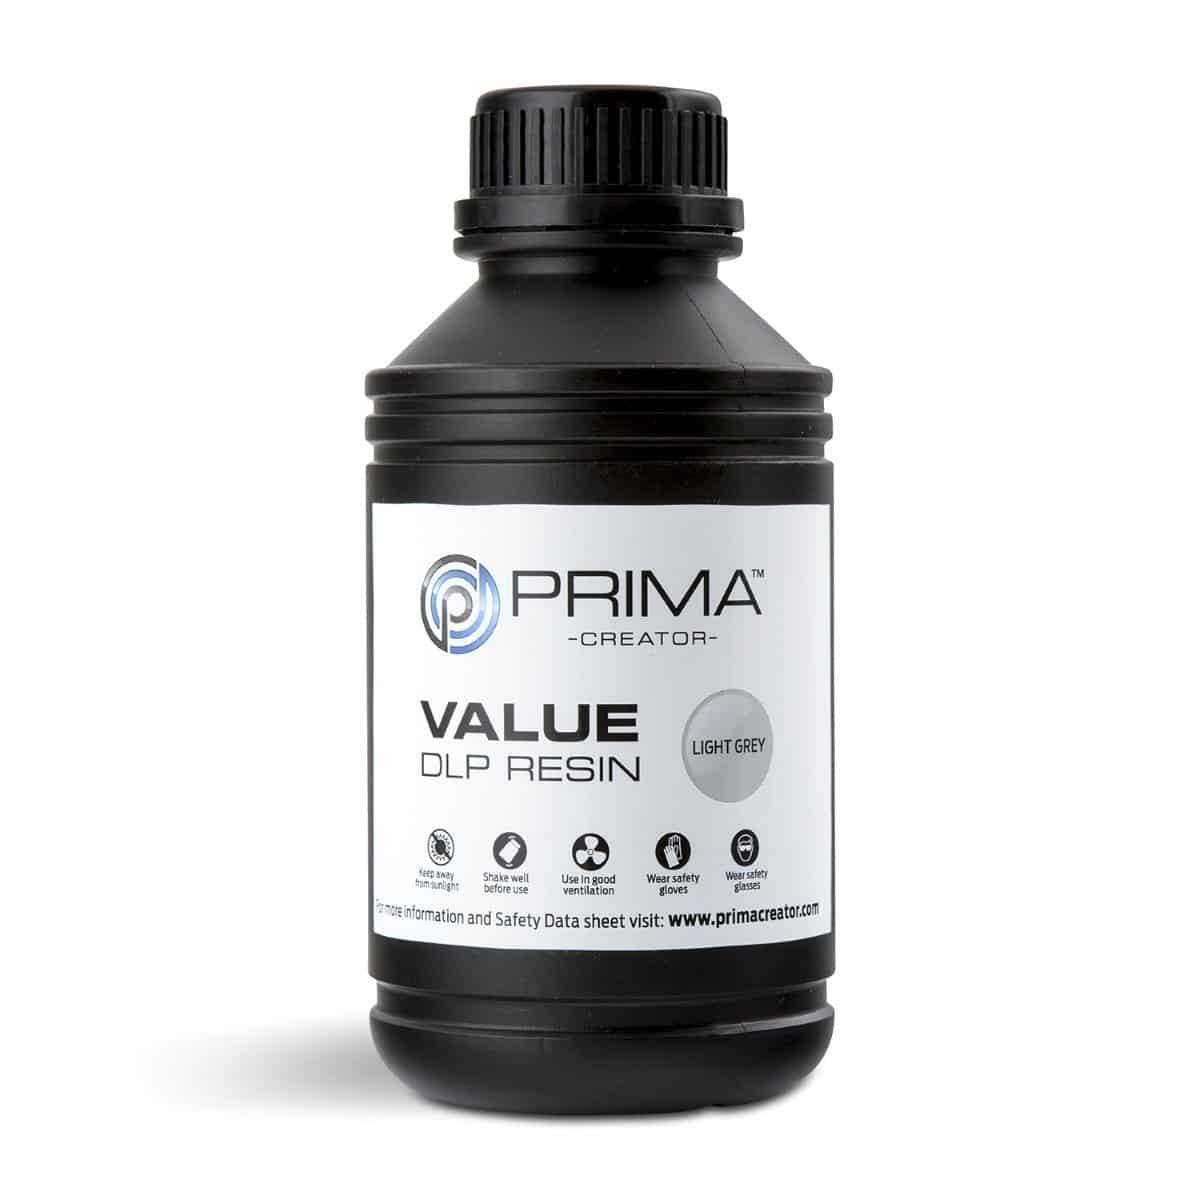 Image of PrimaCreator Value UV / DLP Resin - 500 ml - Light Grey